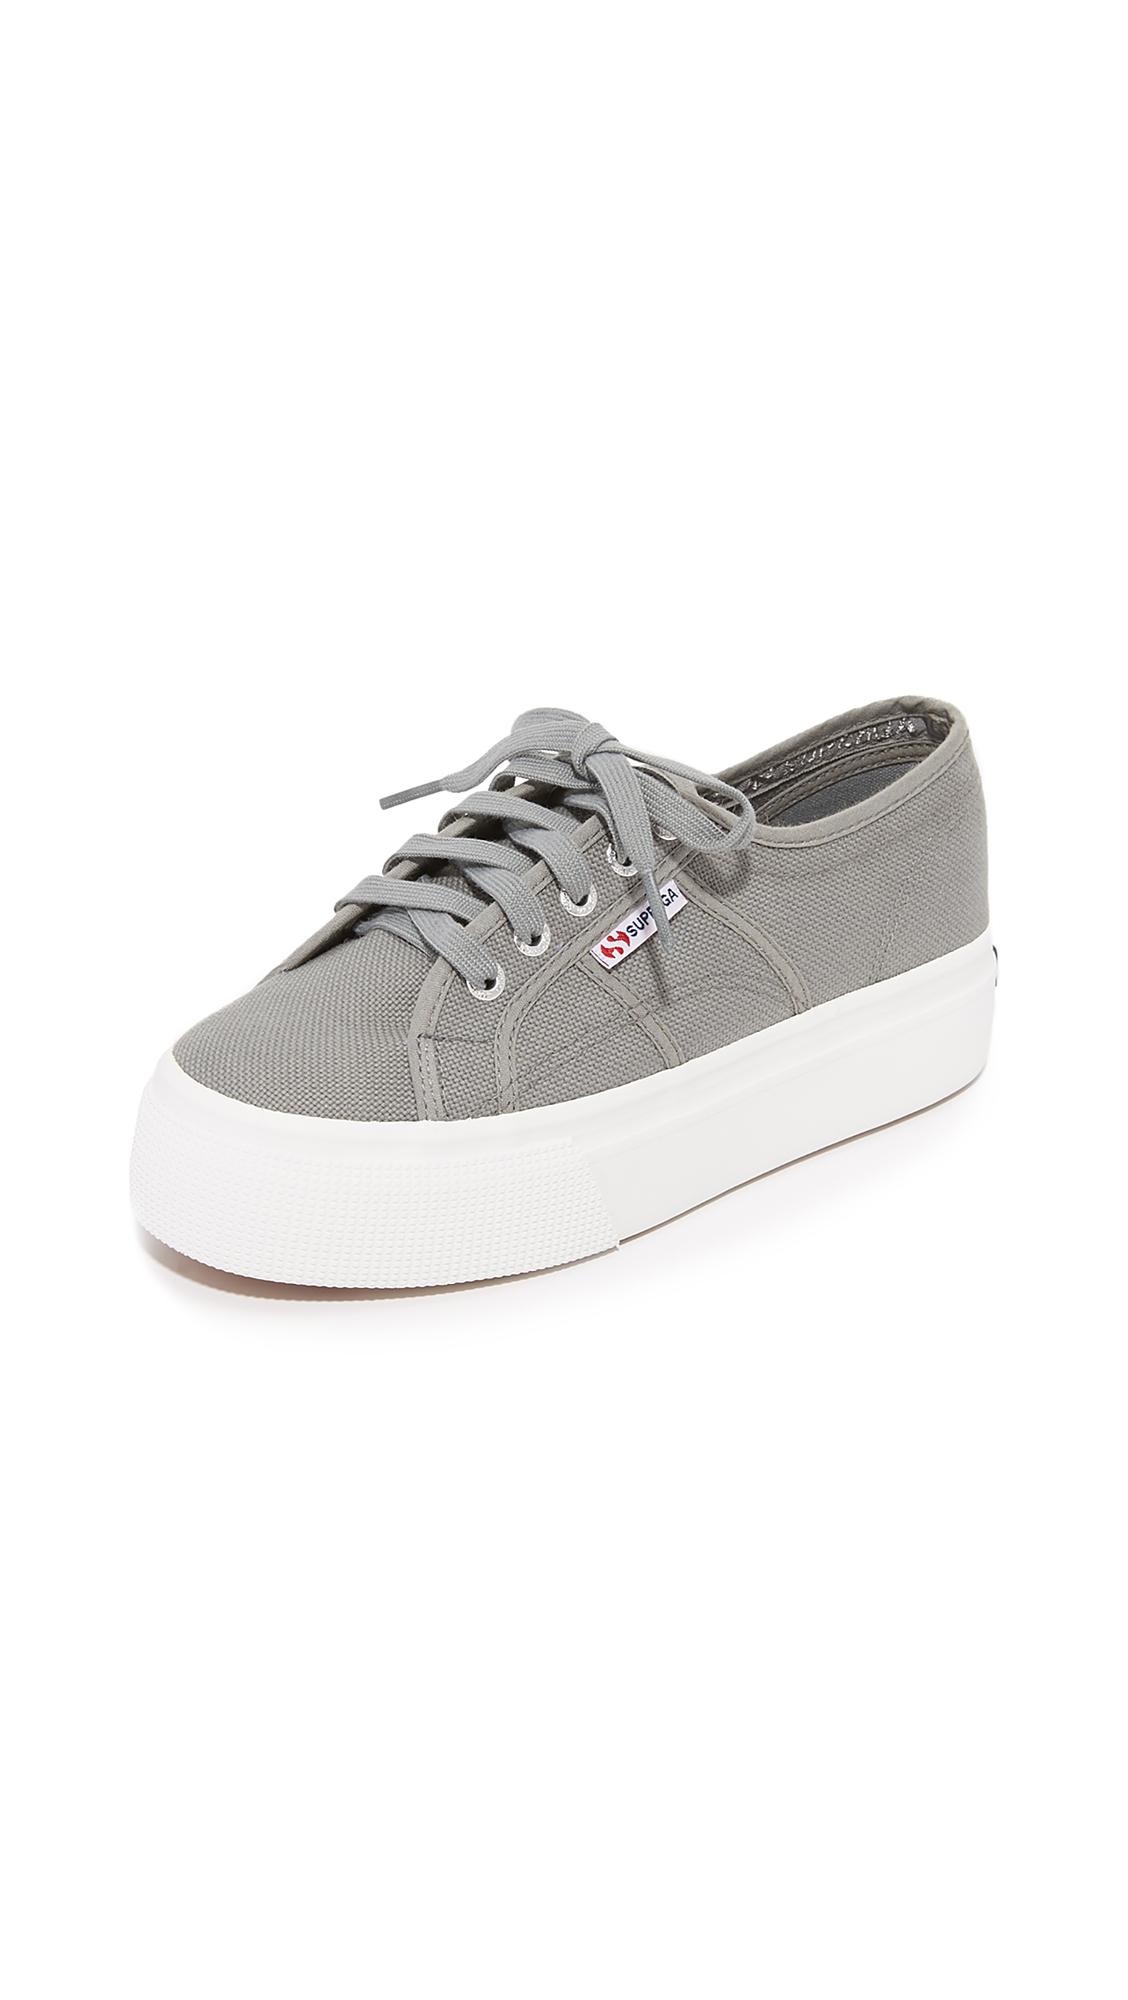 Superga 2790 ACOTW Platform Sneakers - Grey Sage